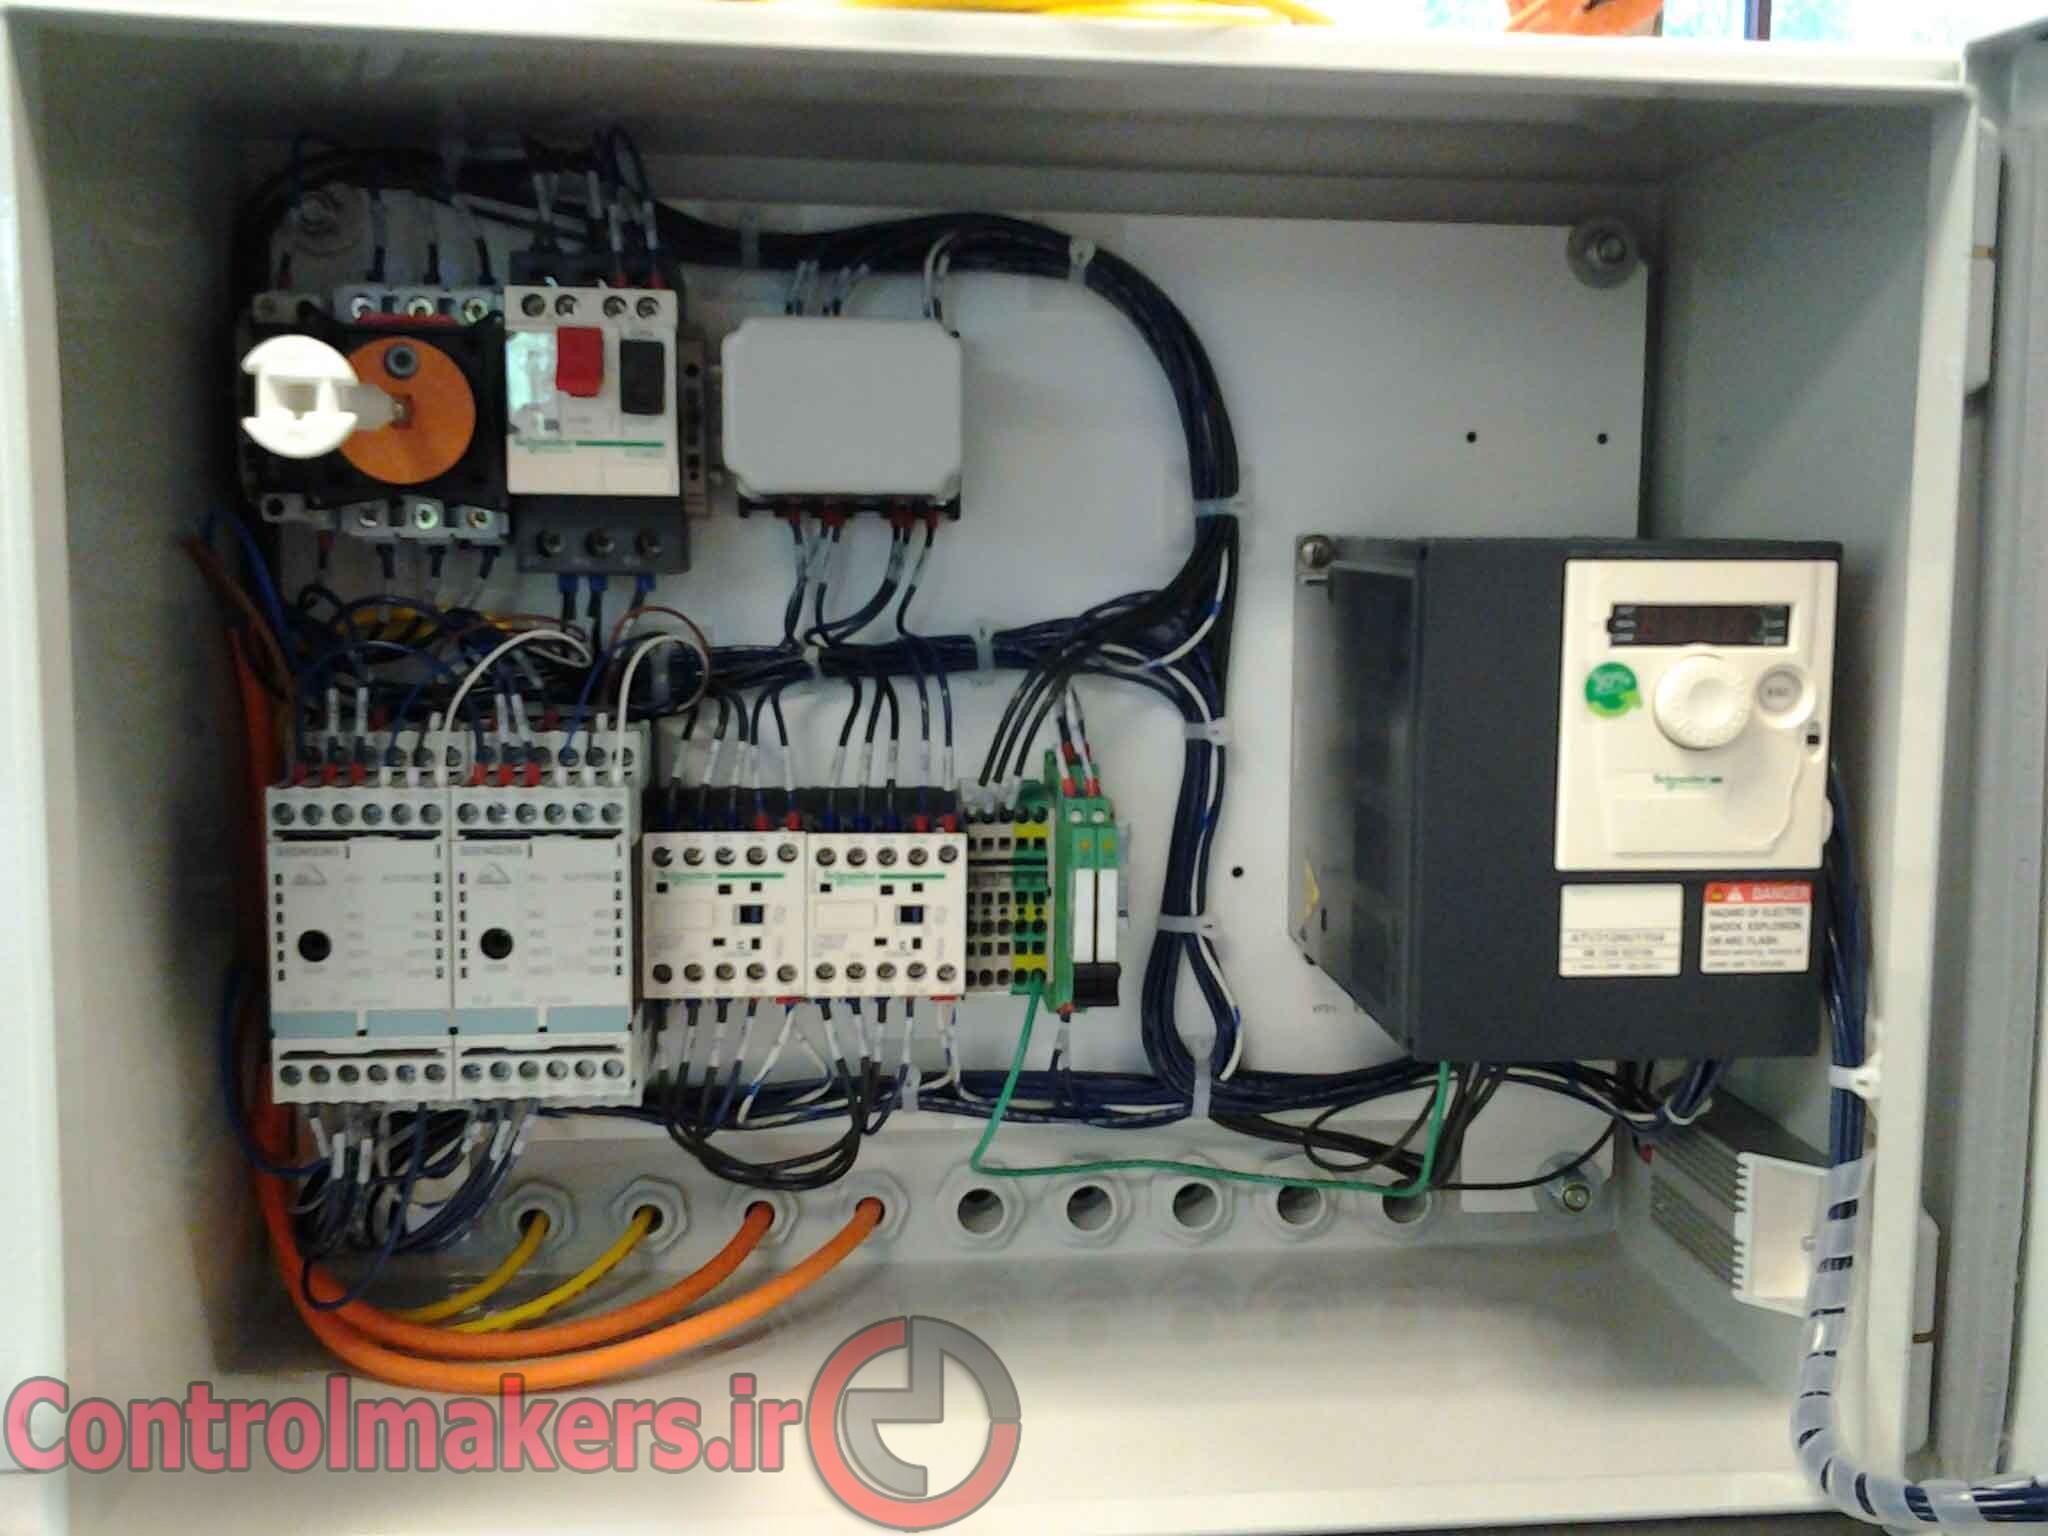 Wiring industrial Control www.ControlMakers (1)